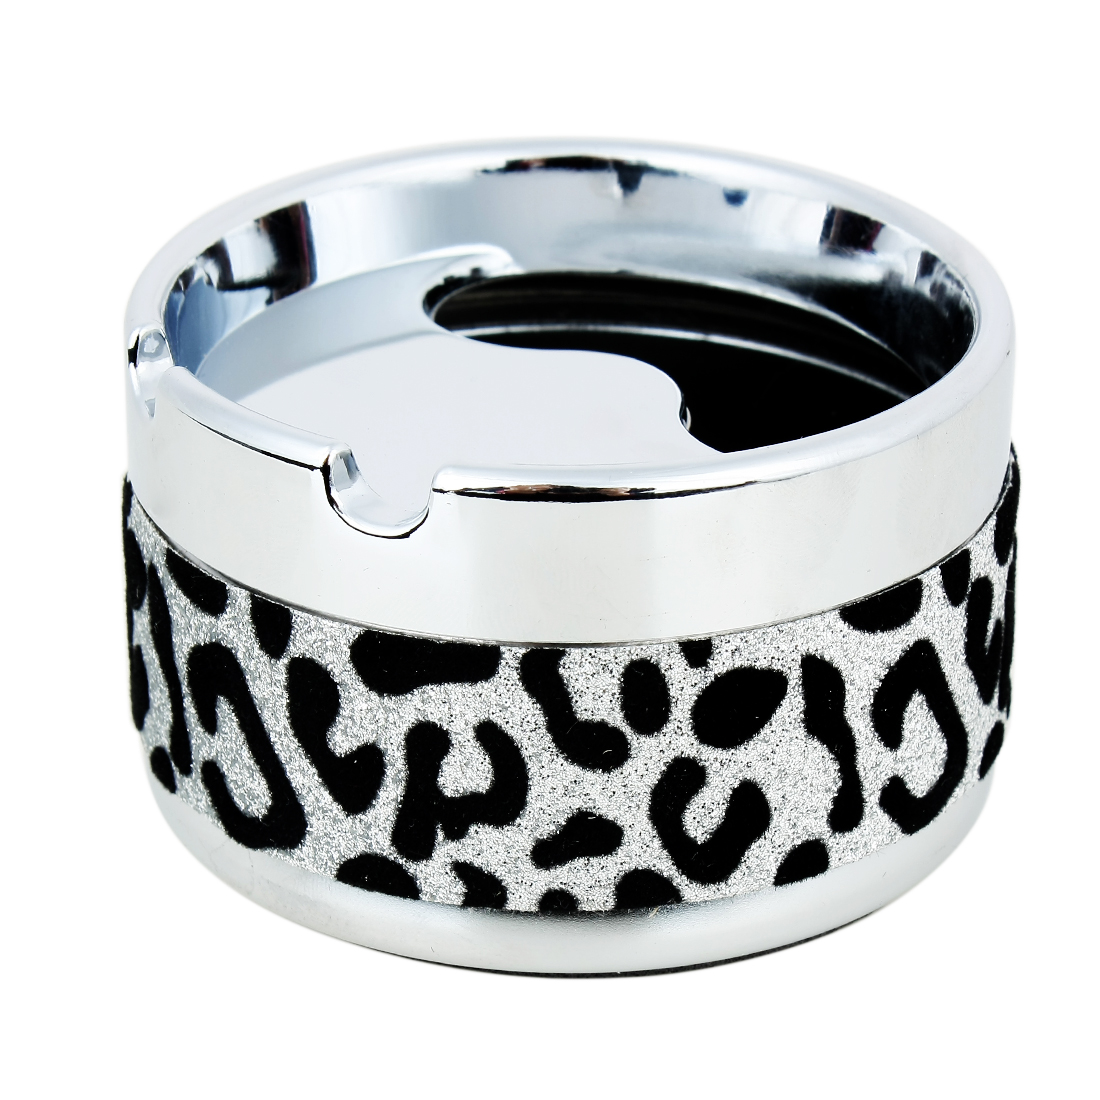 Cylinder Shape Car Cigarette Ash Holder Cup Case Ashtray Black Silver Tone